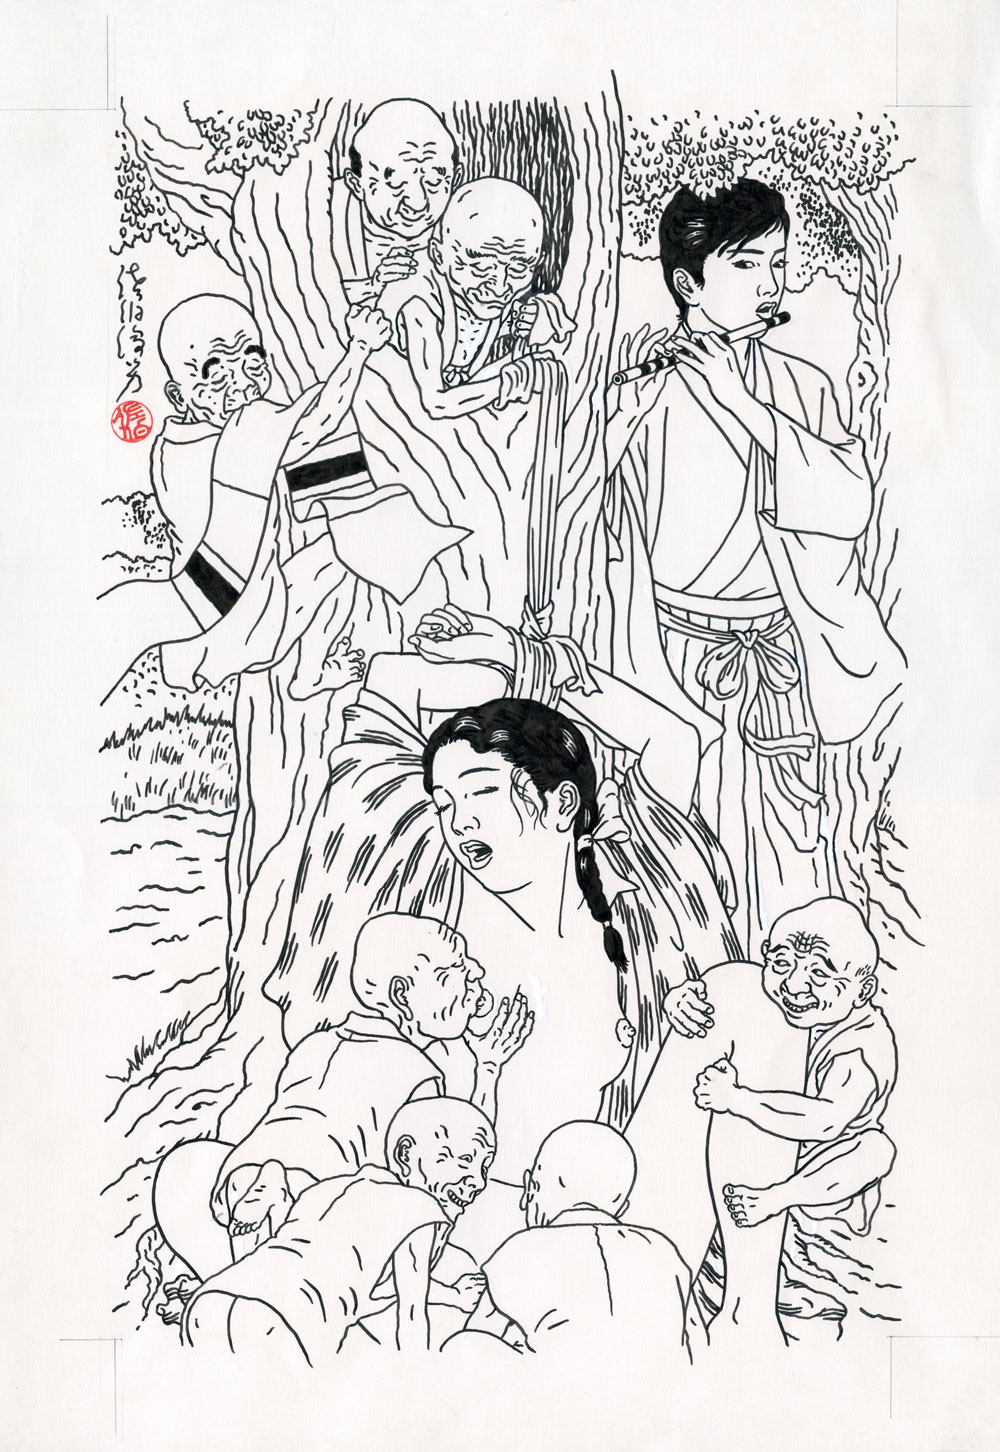 Toshio SaekiYaetsubue11.75 x 17 in. Ink on paper, vellum1986